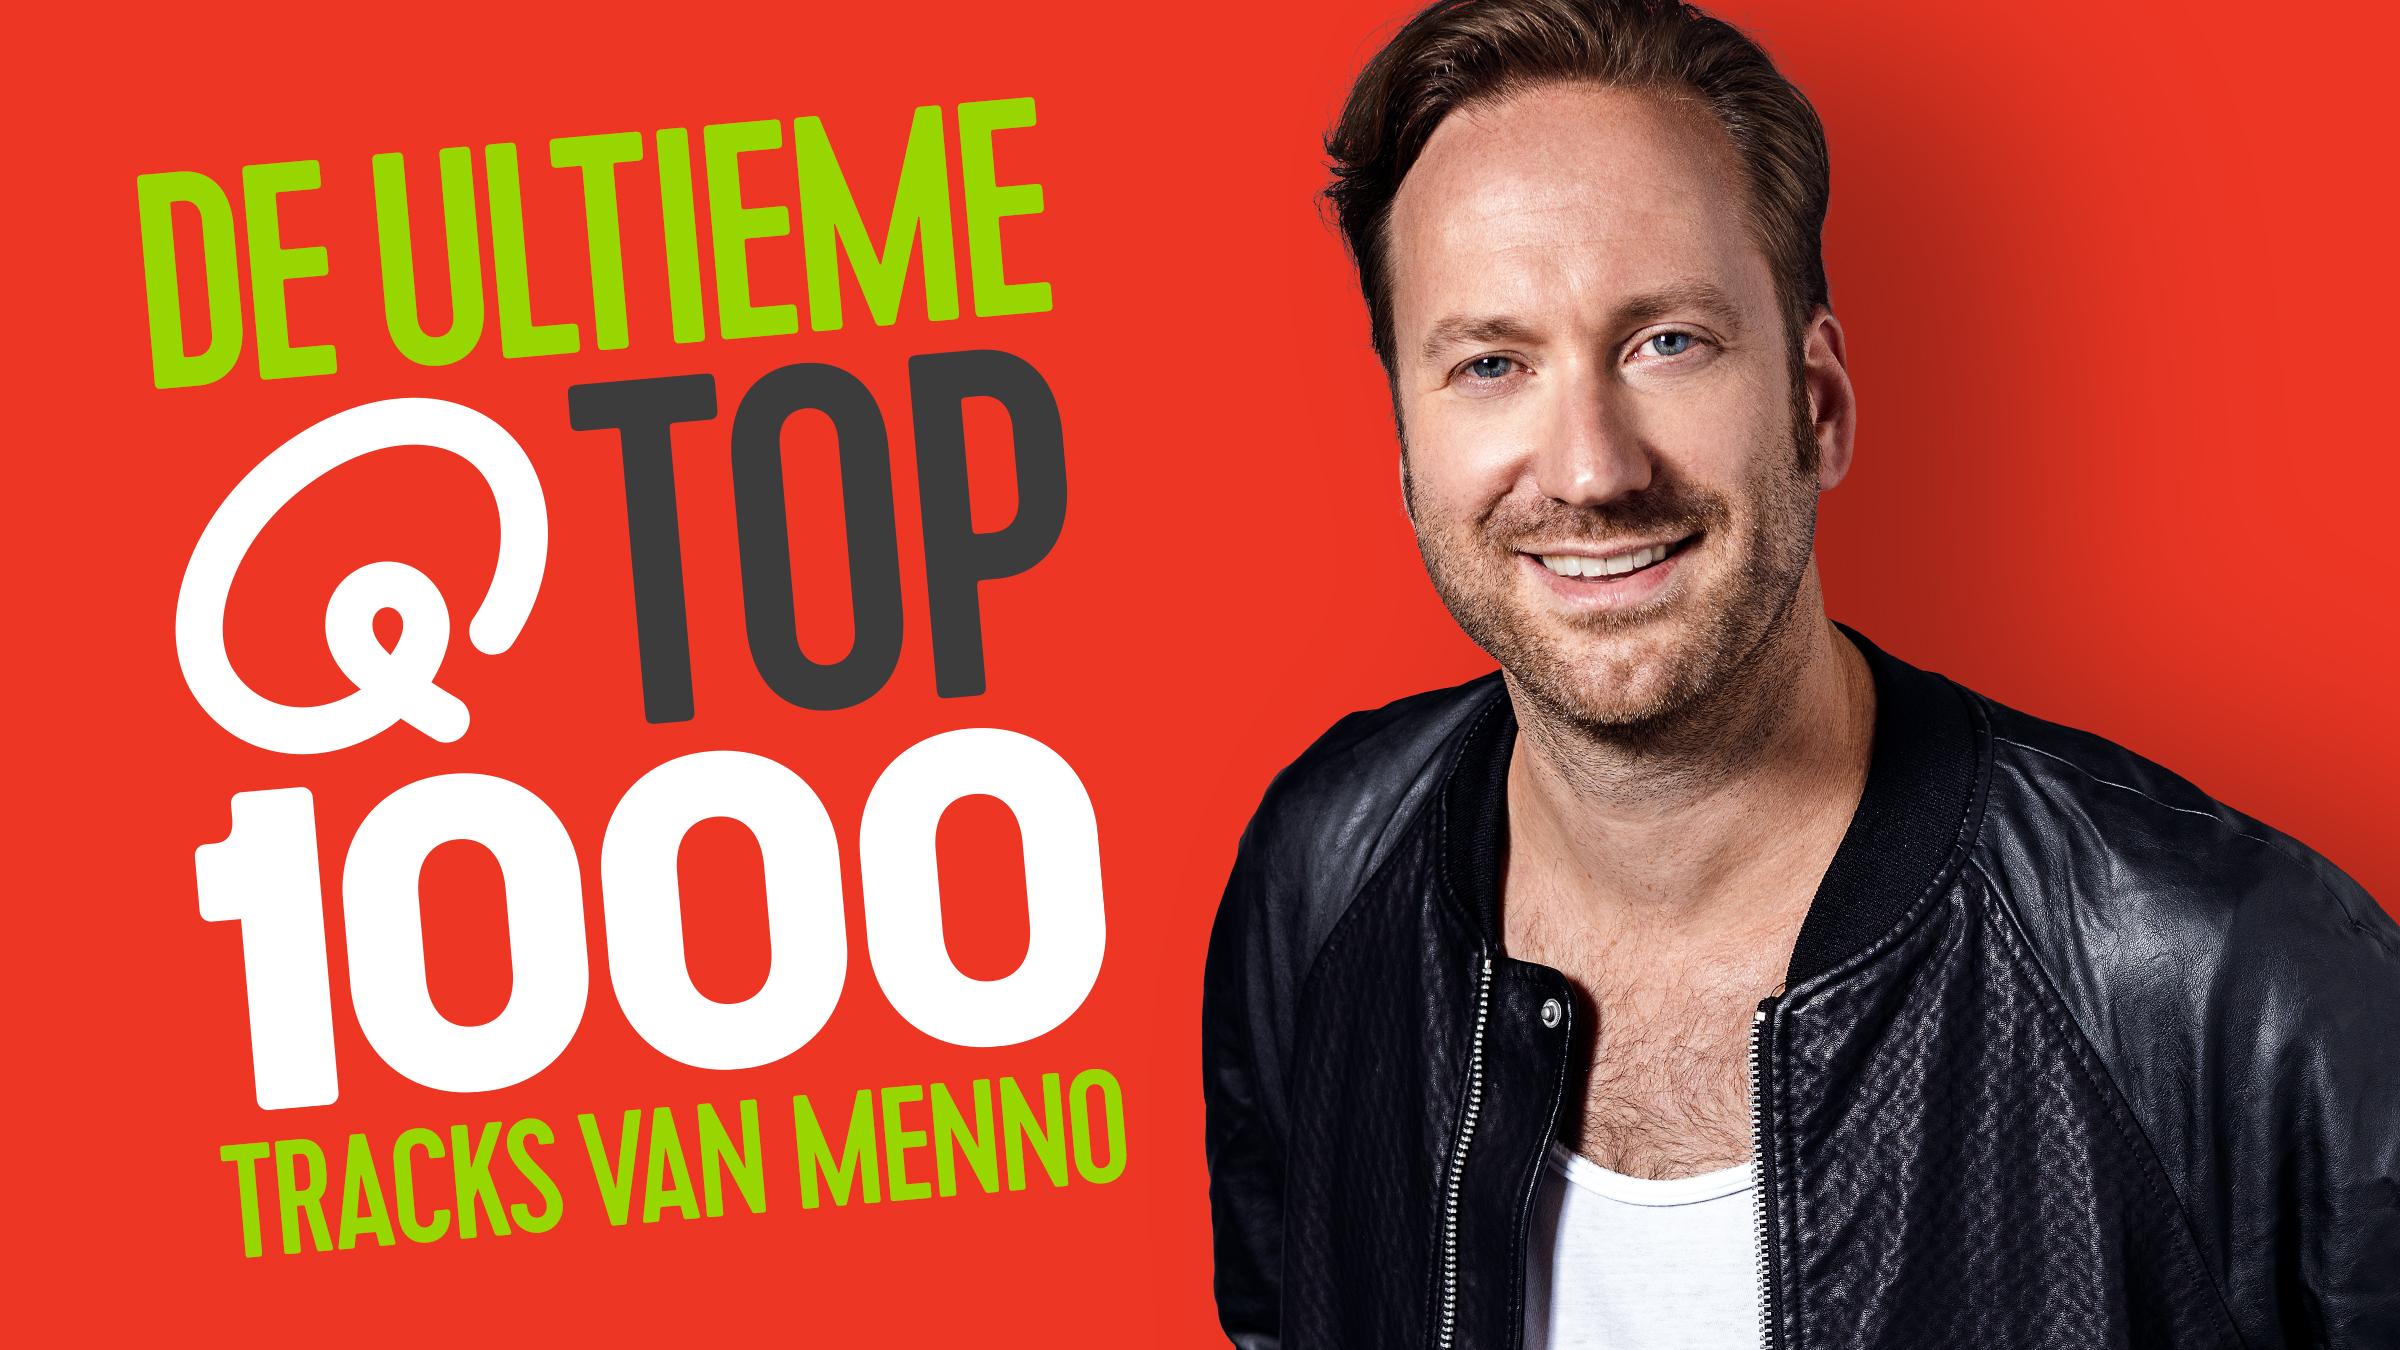 Qmusic teaser qtop1000 dj menno